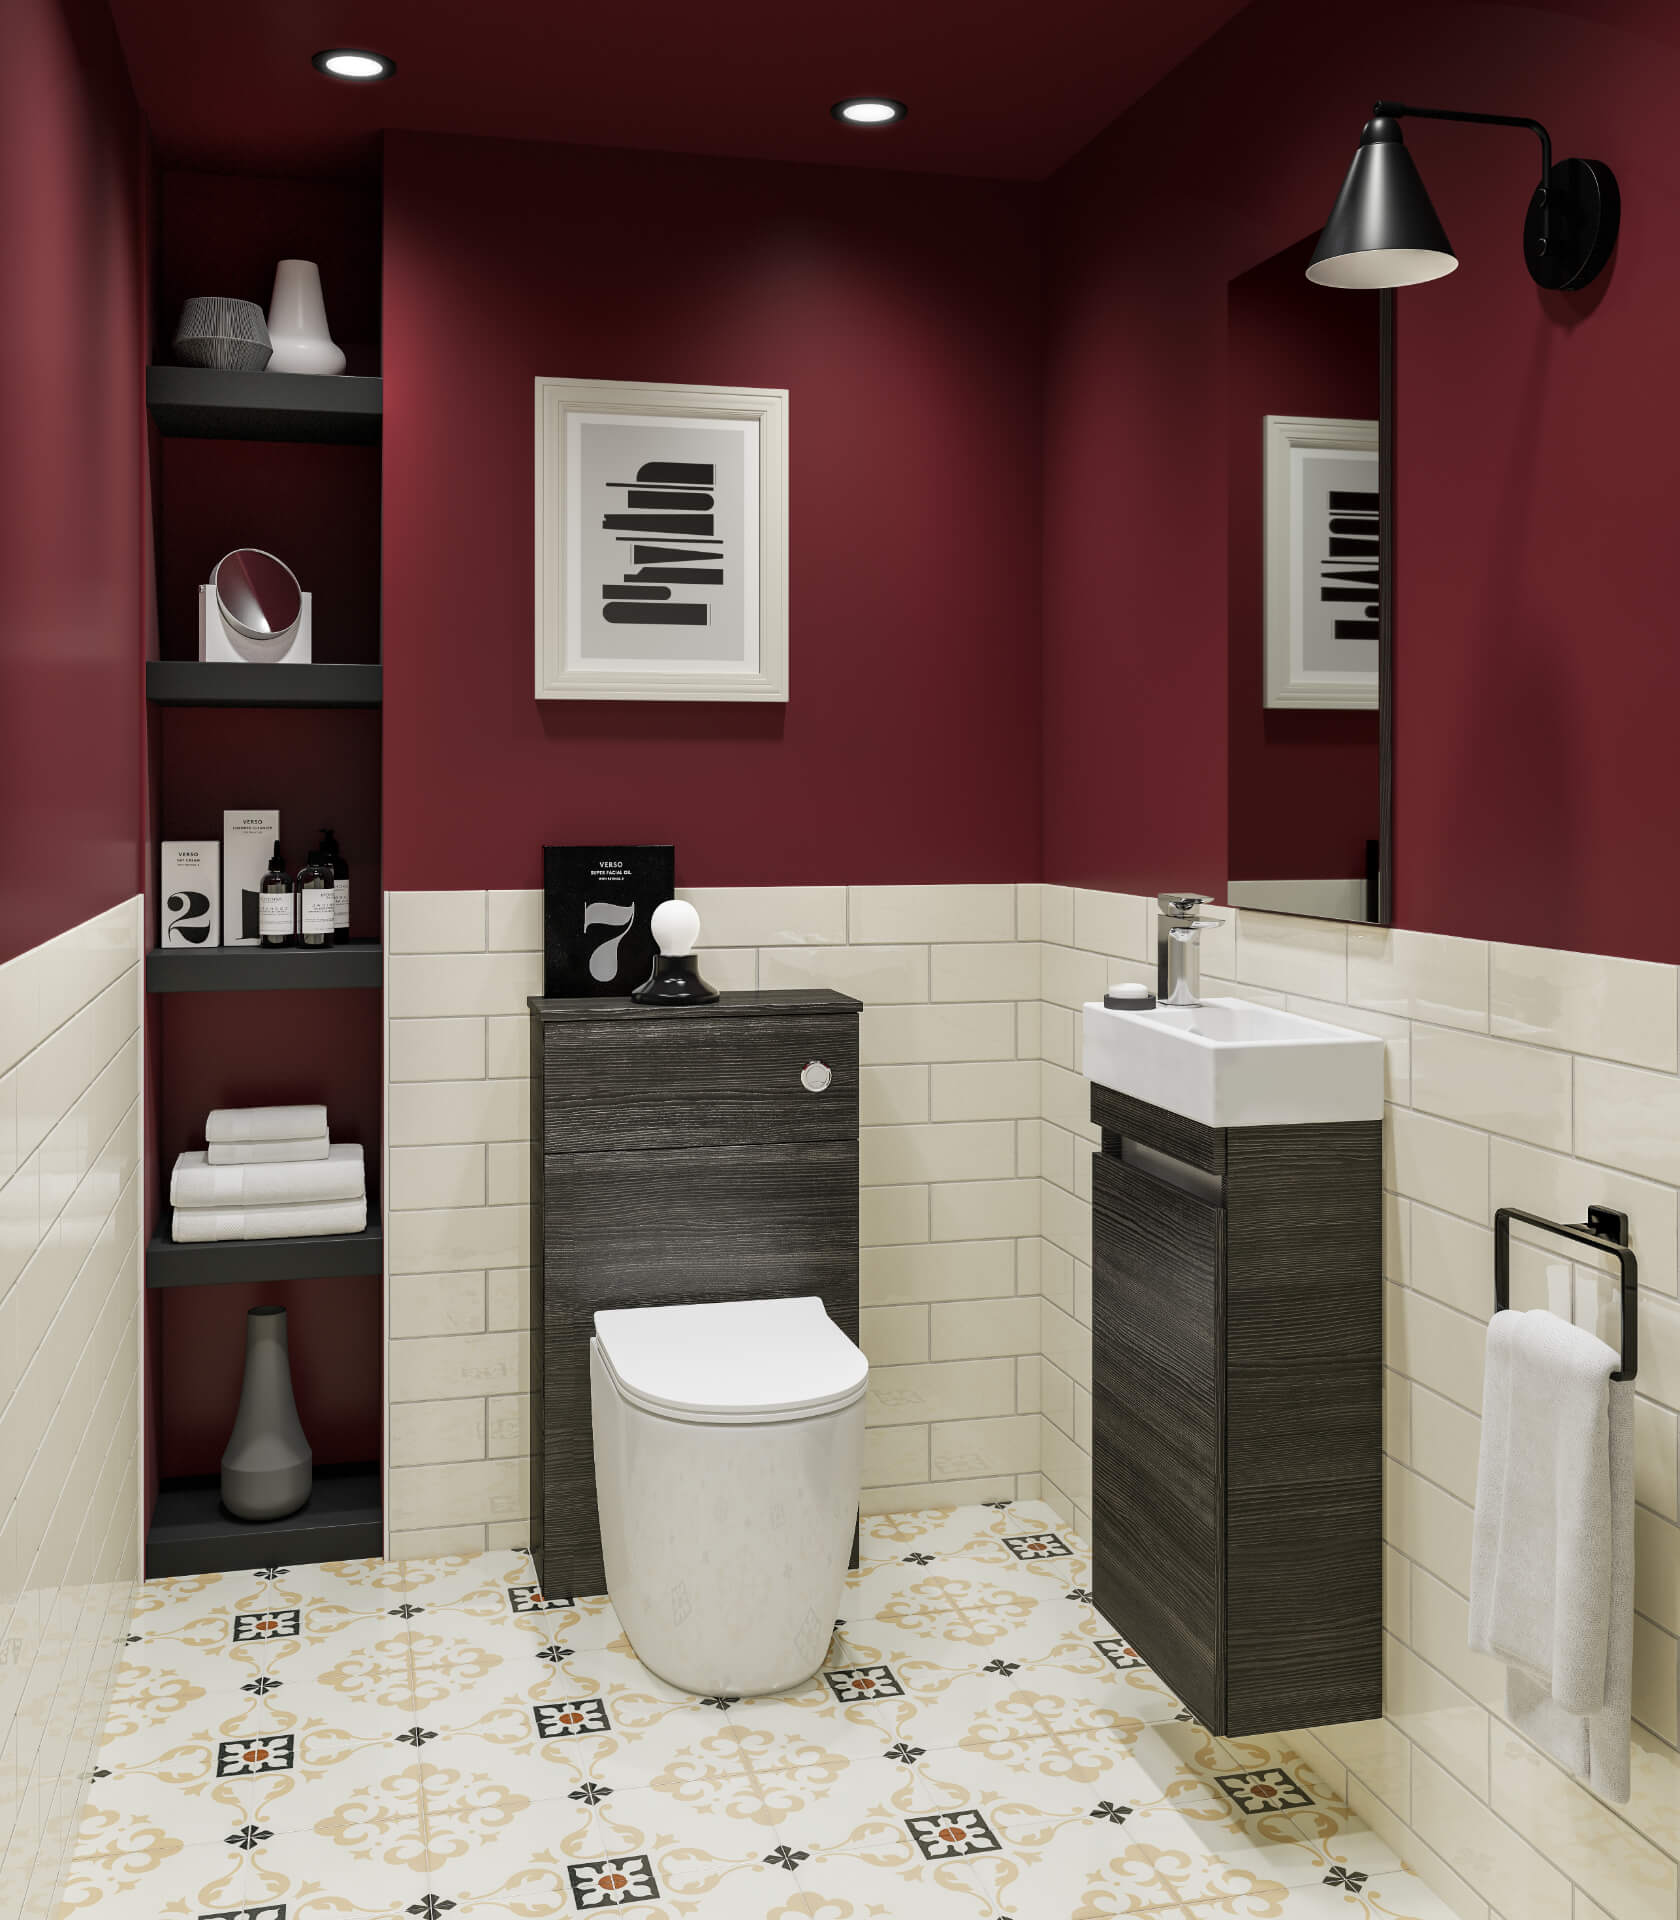 Utopia Bathroom Qube Wooden Bathroom